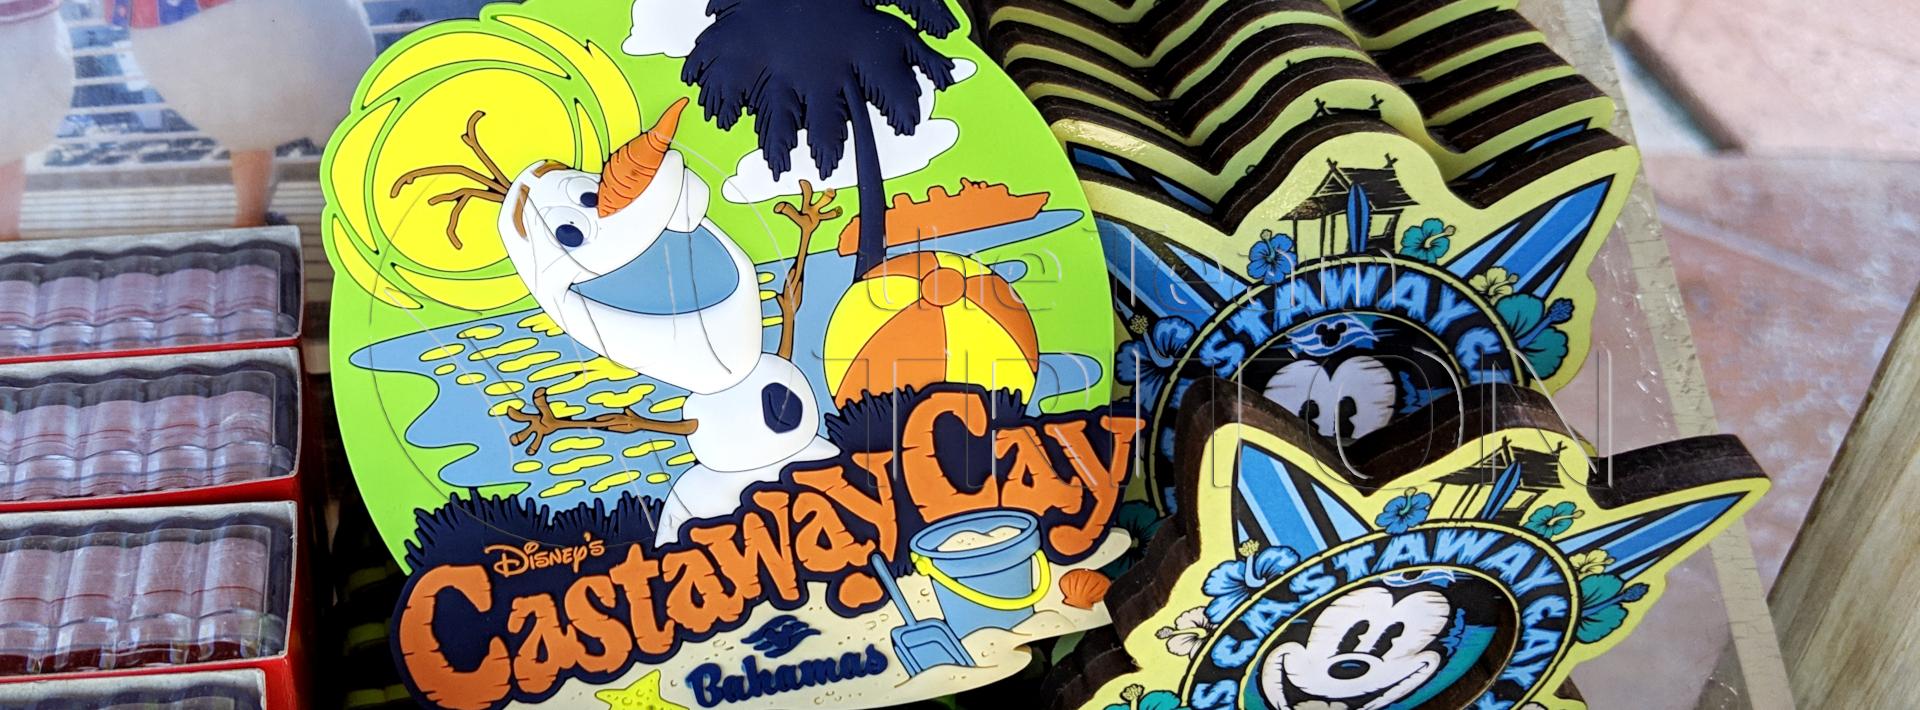 Castaway-Cay-Merchandise-eyecatch-001